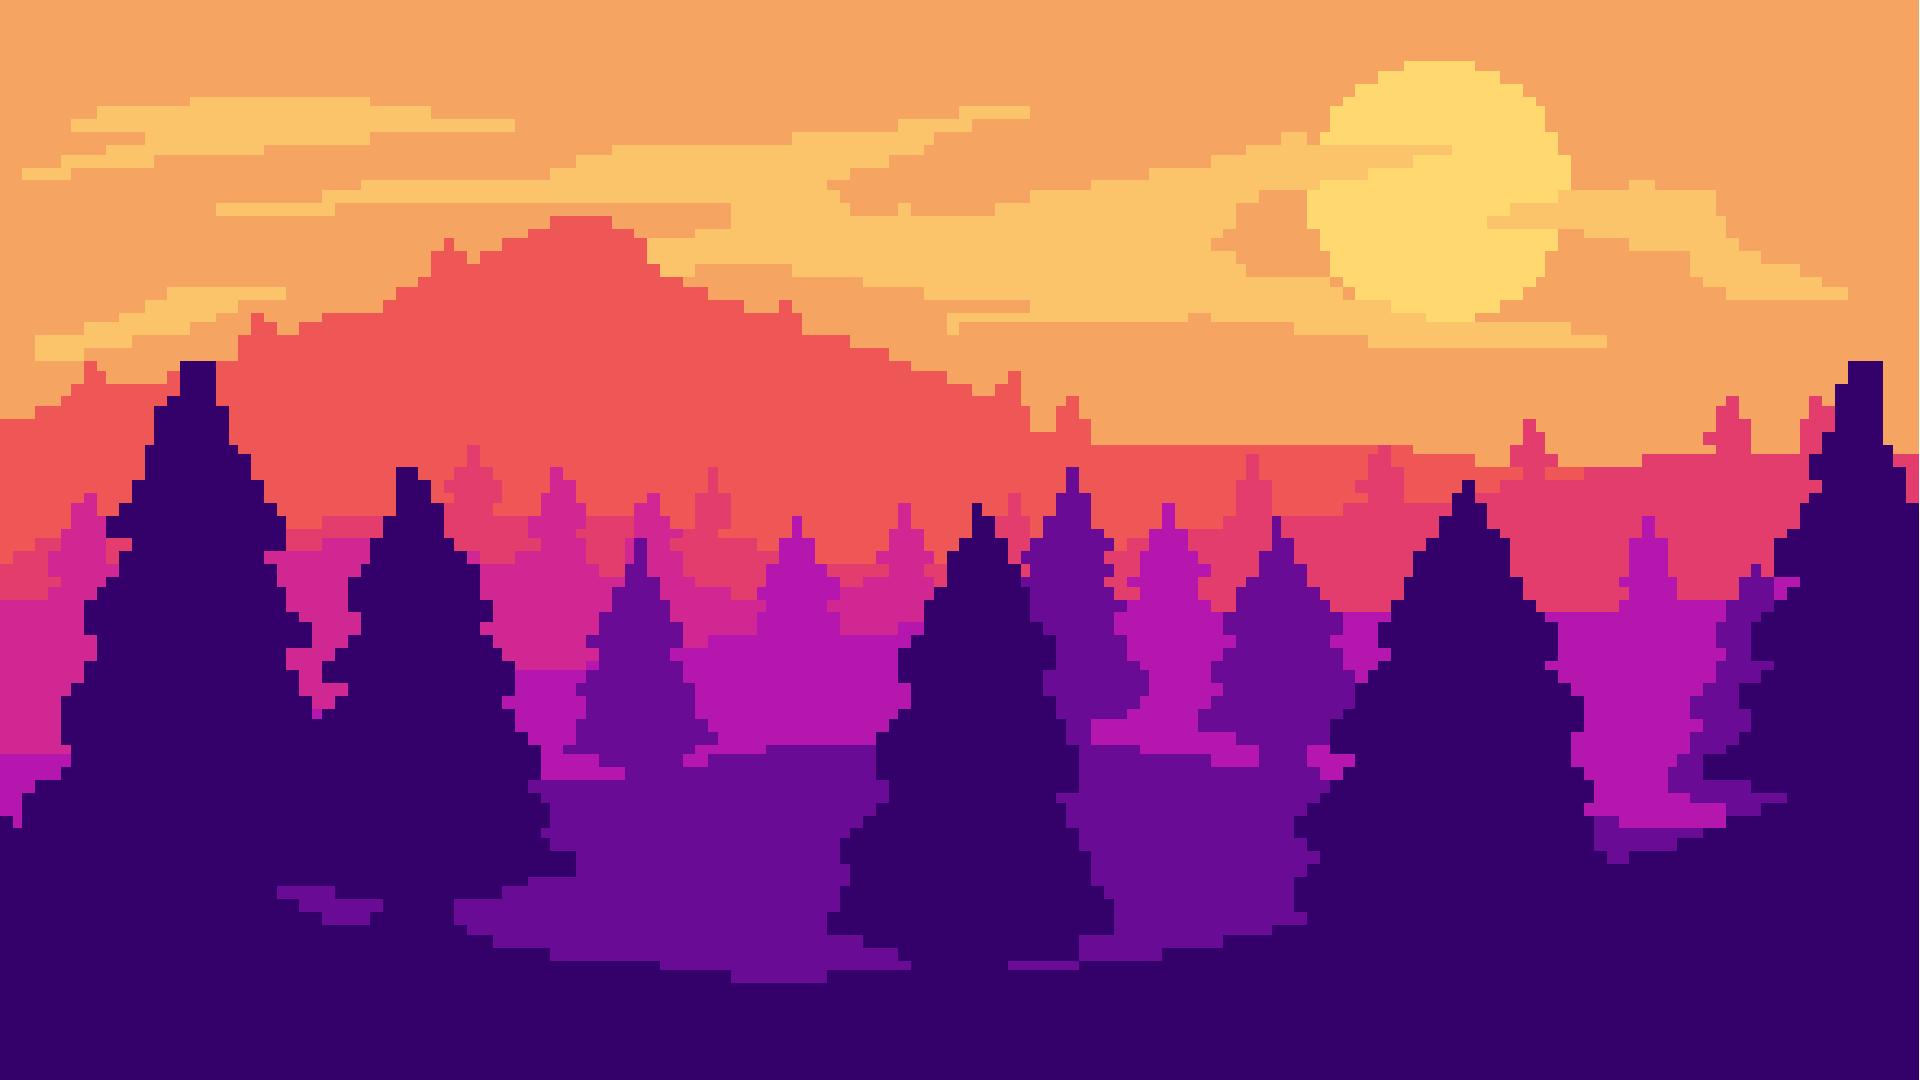 Pixel art landscape by Mockingjay1701